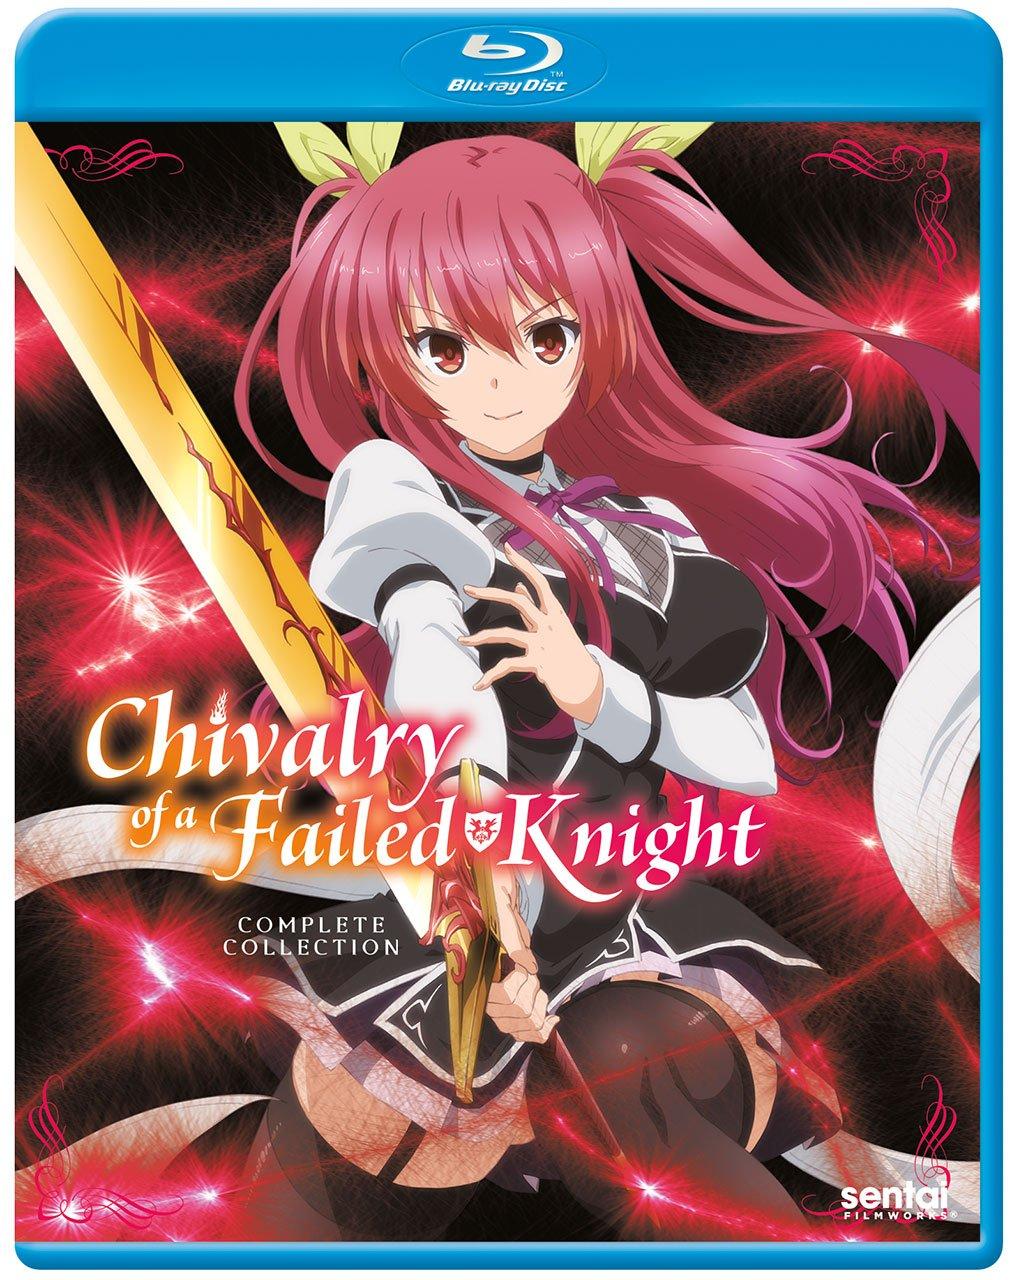 chivalry of a failed knight ikki